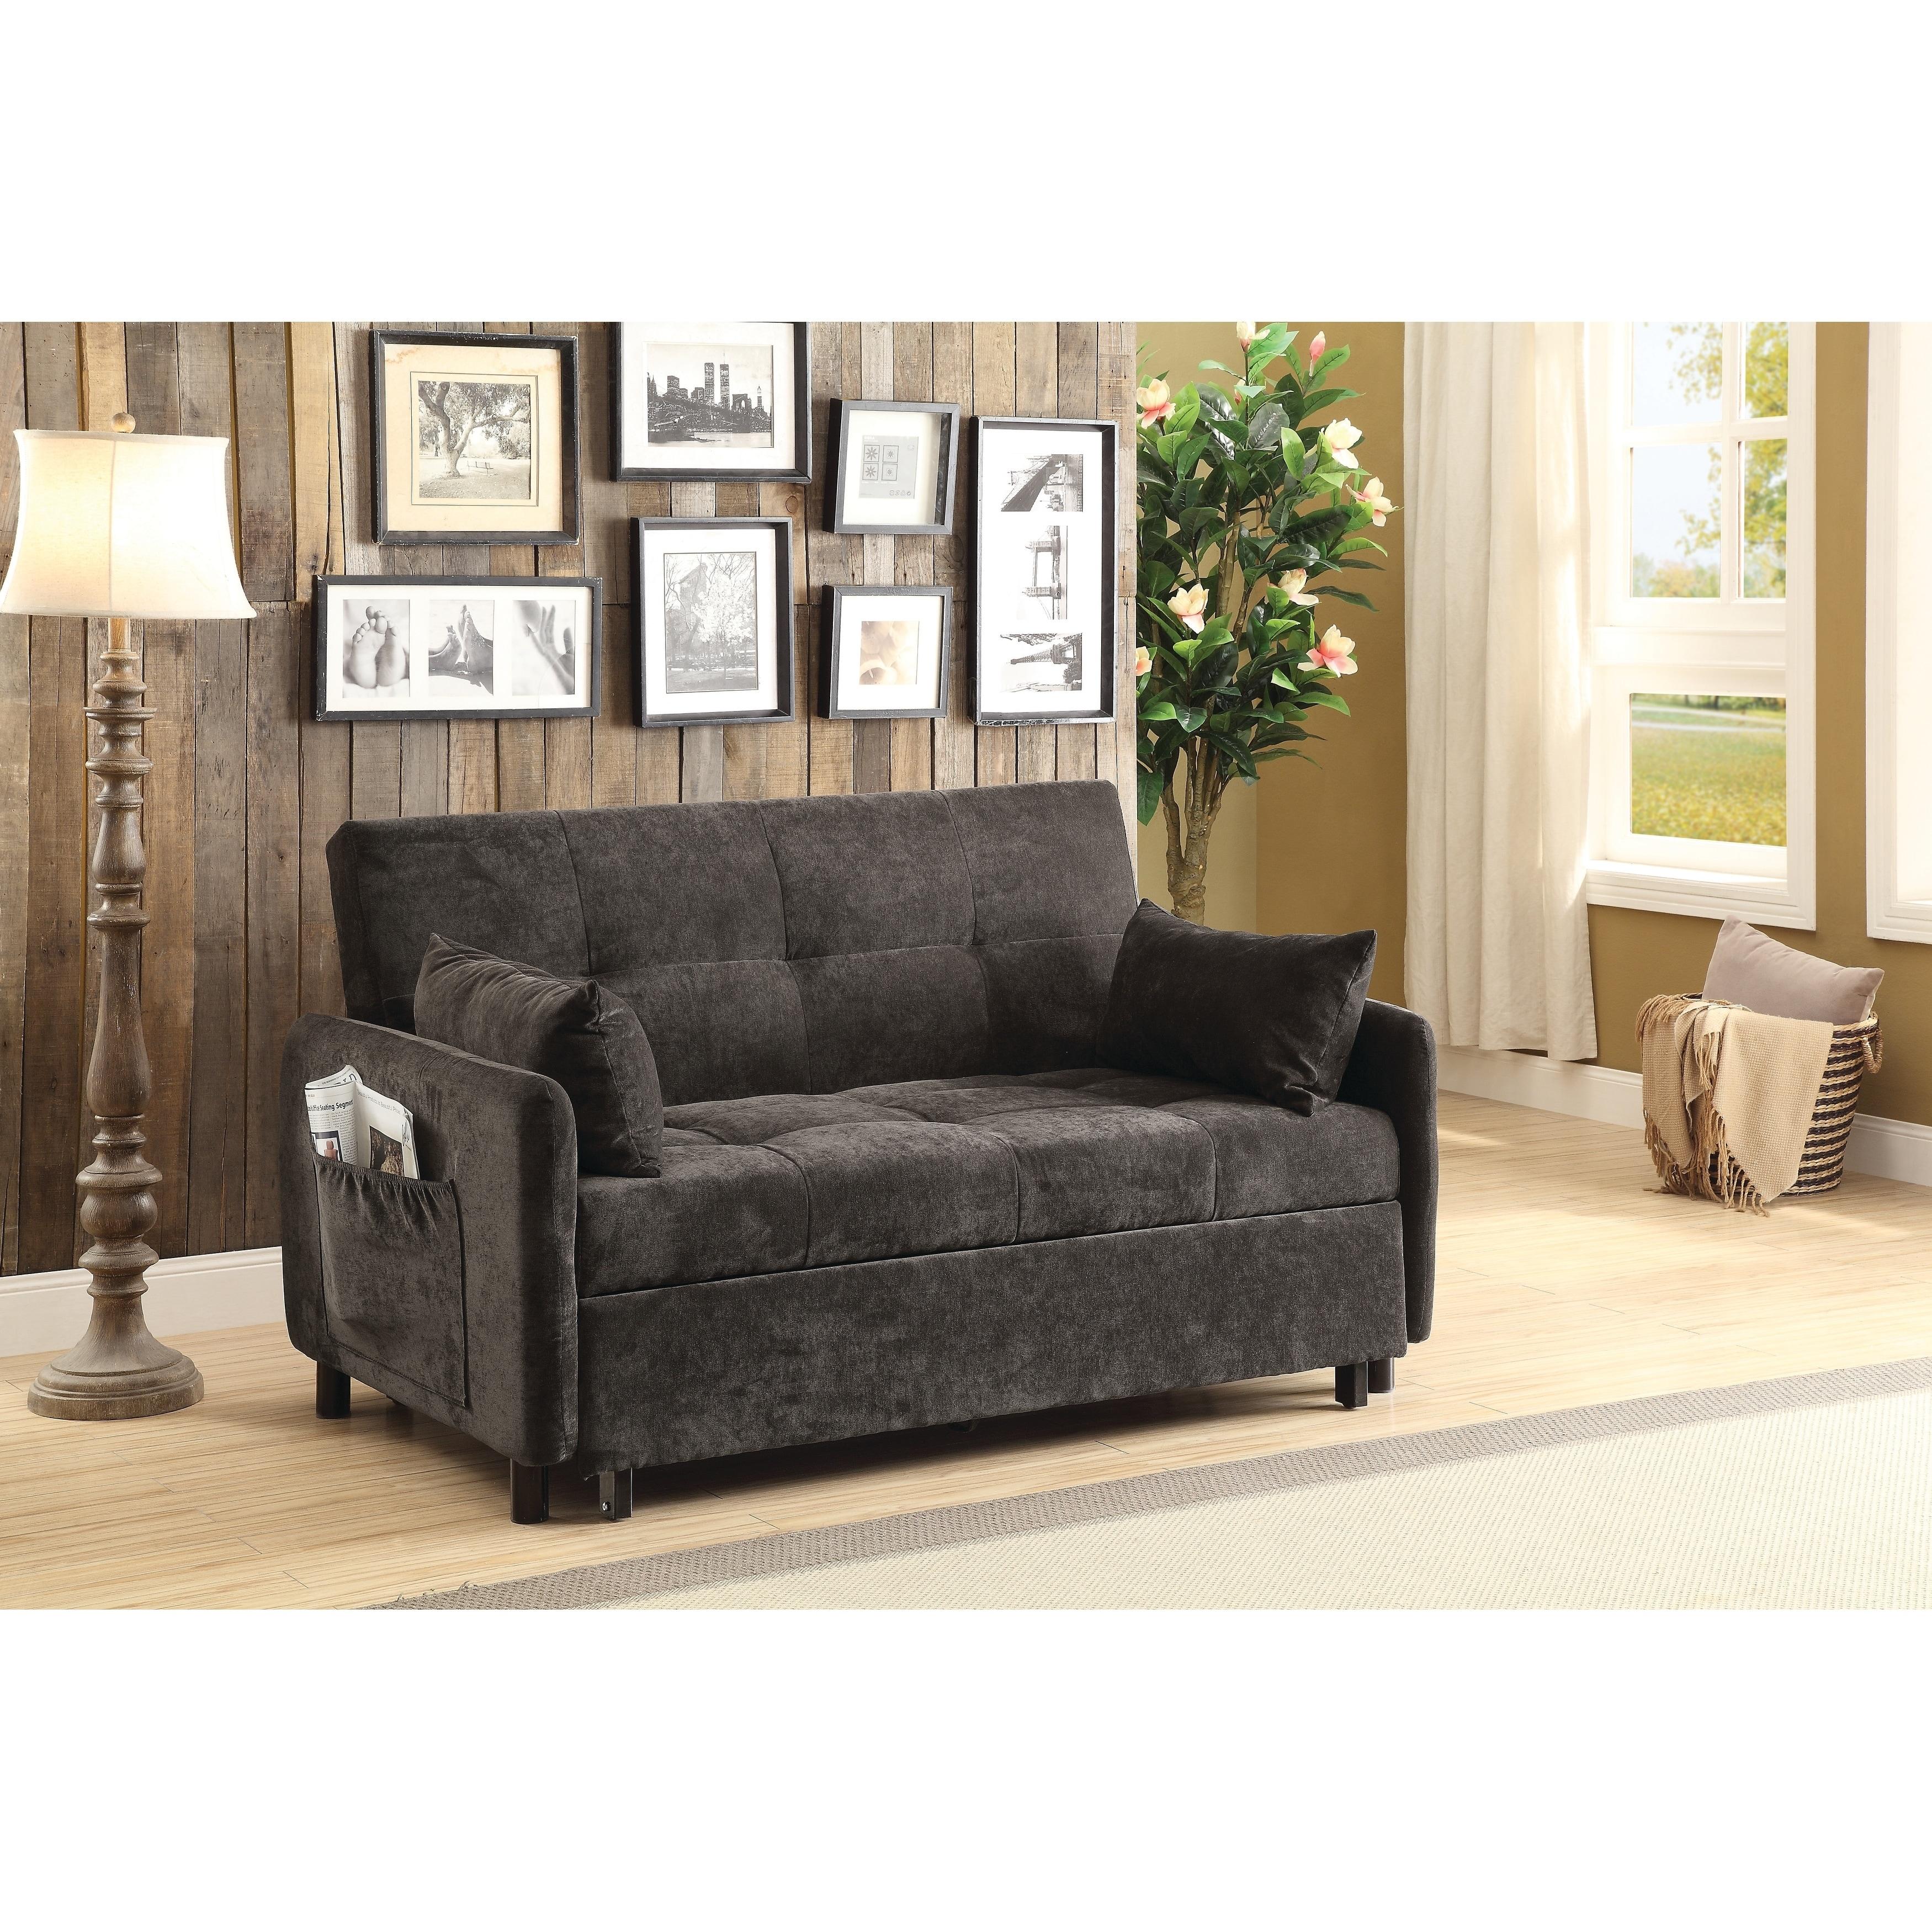 Transitional Dark Brown Sofa Bed - 60\